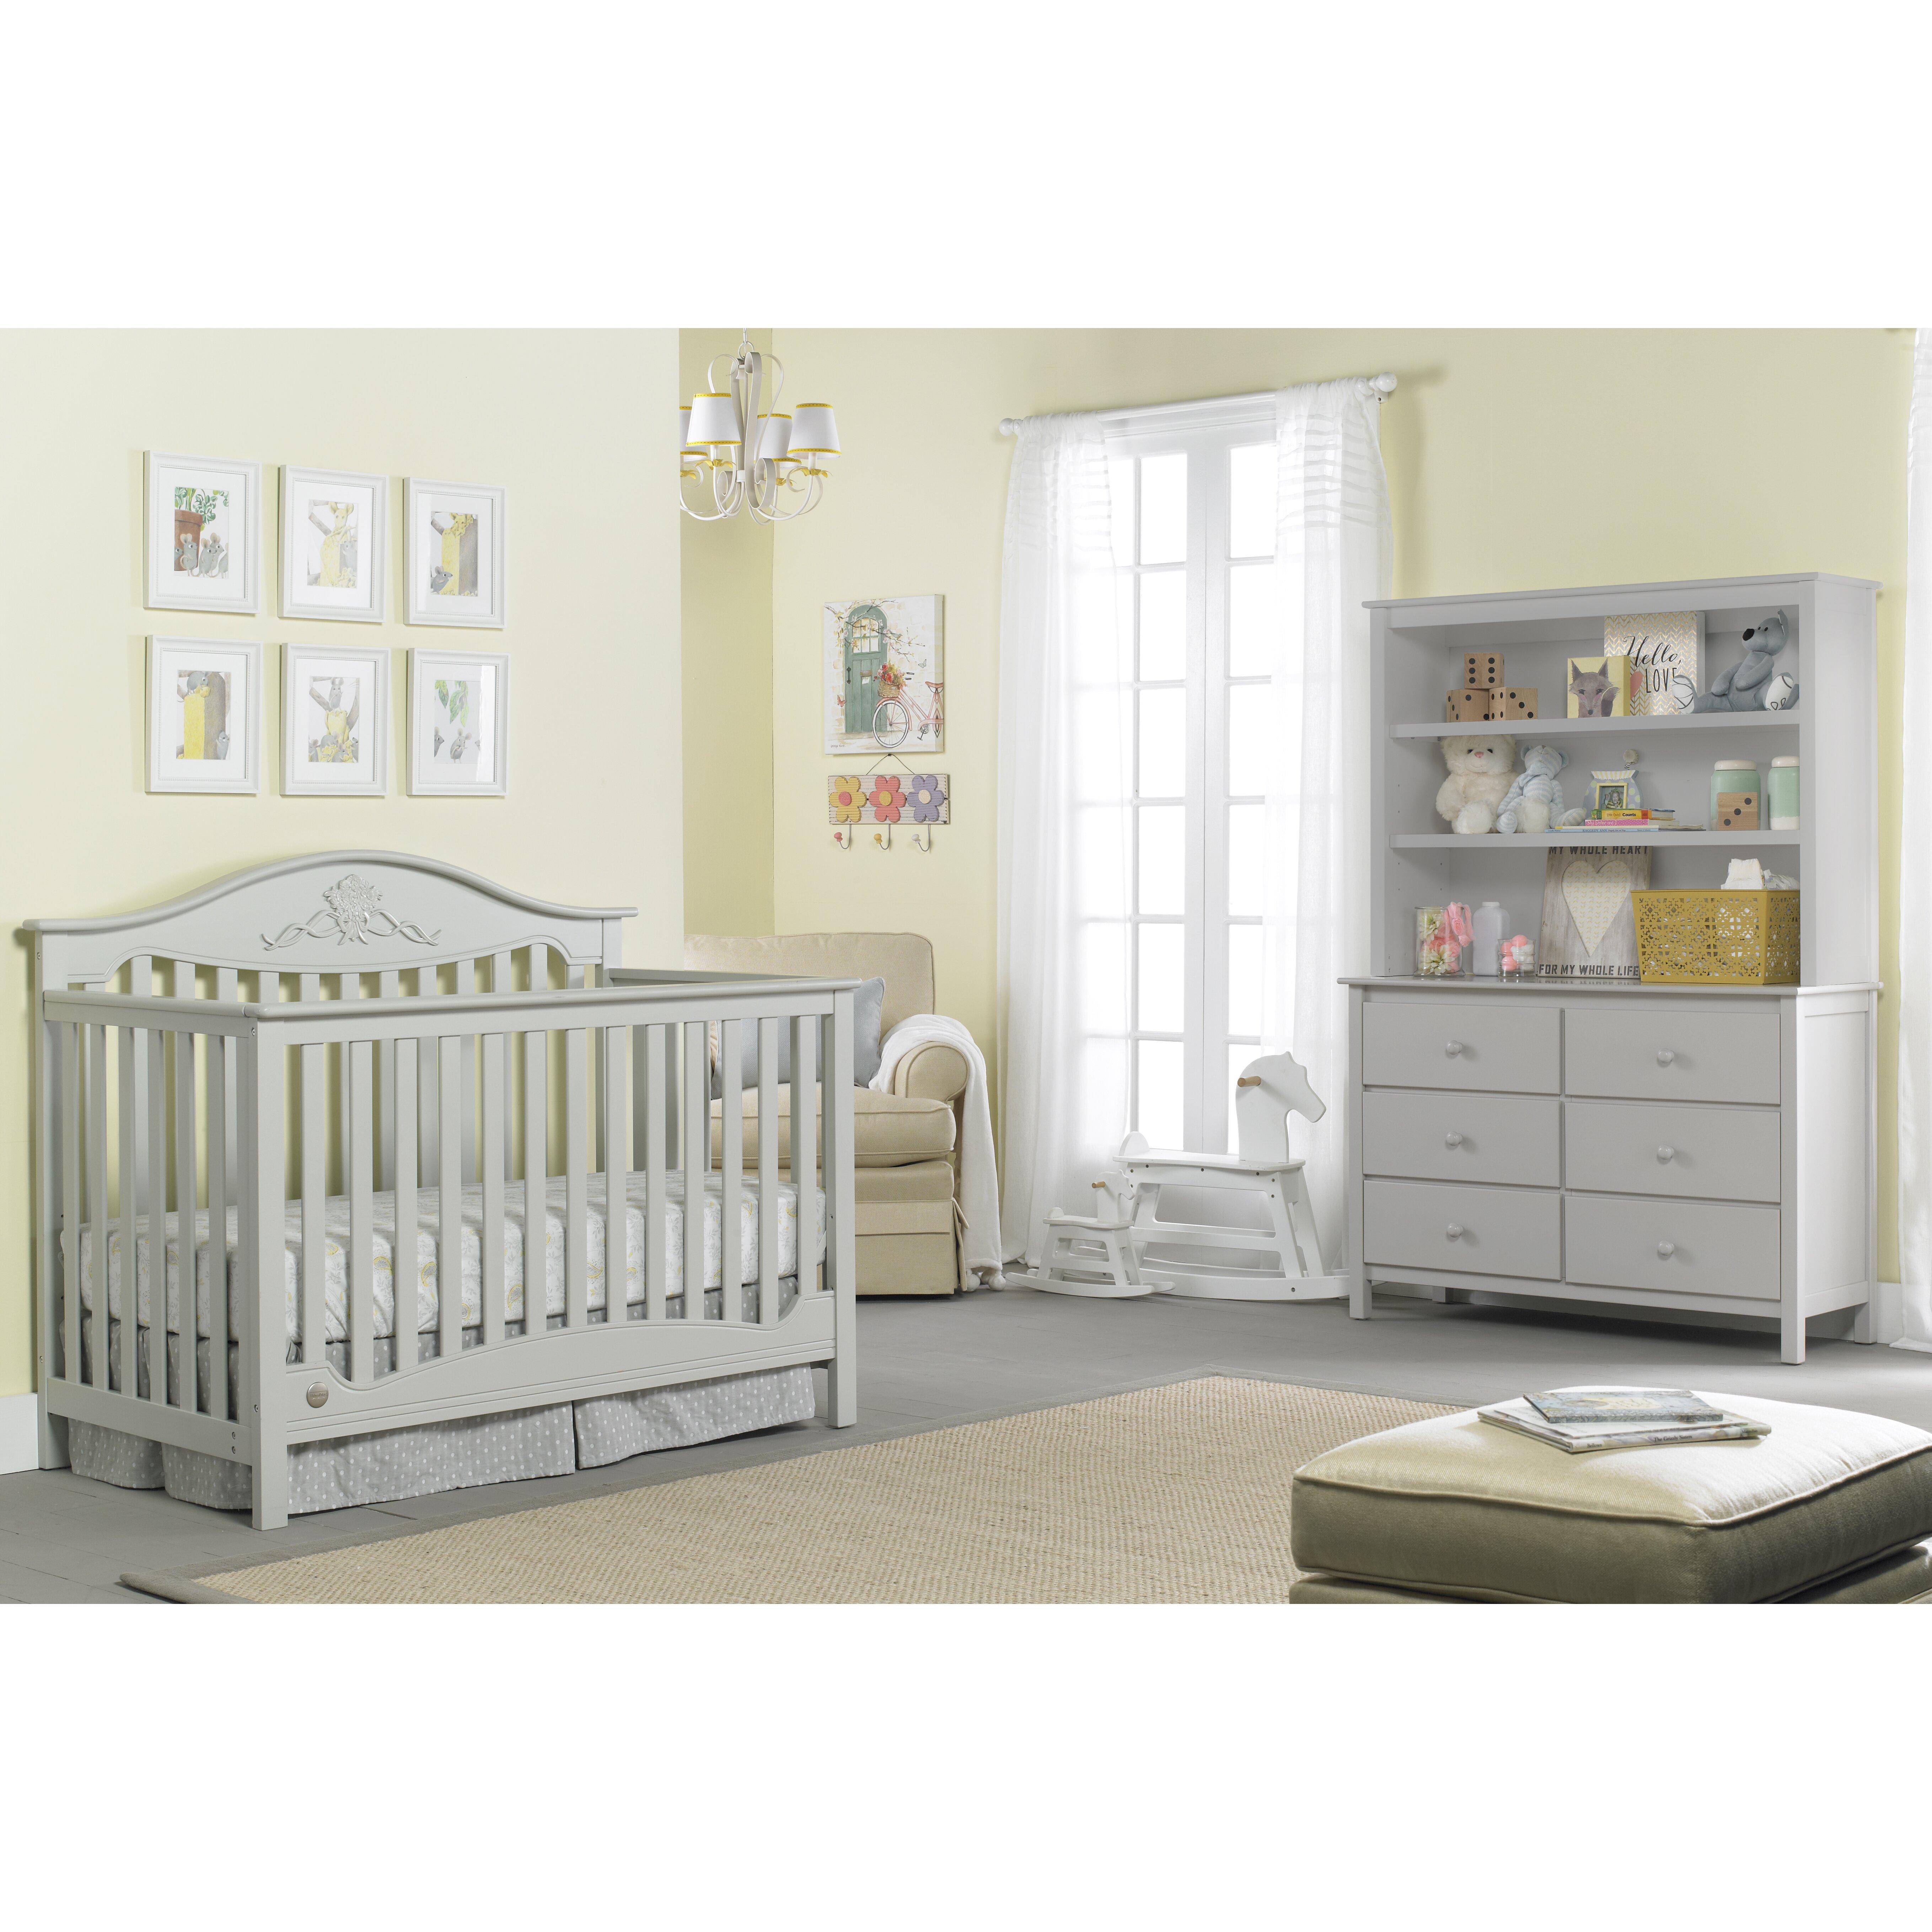 Fisher-Price Mia 4-in-1 Convertible Crib & Reviews | Wayfair